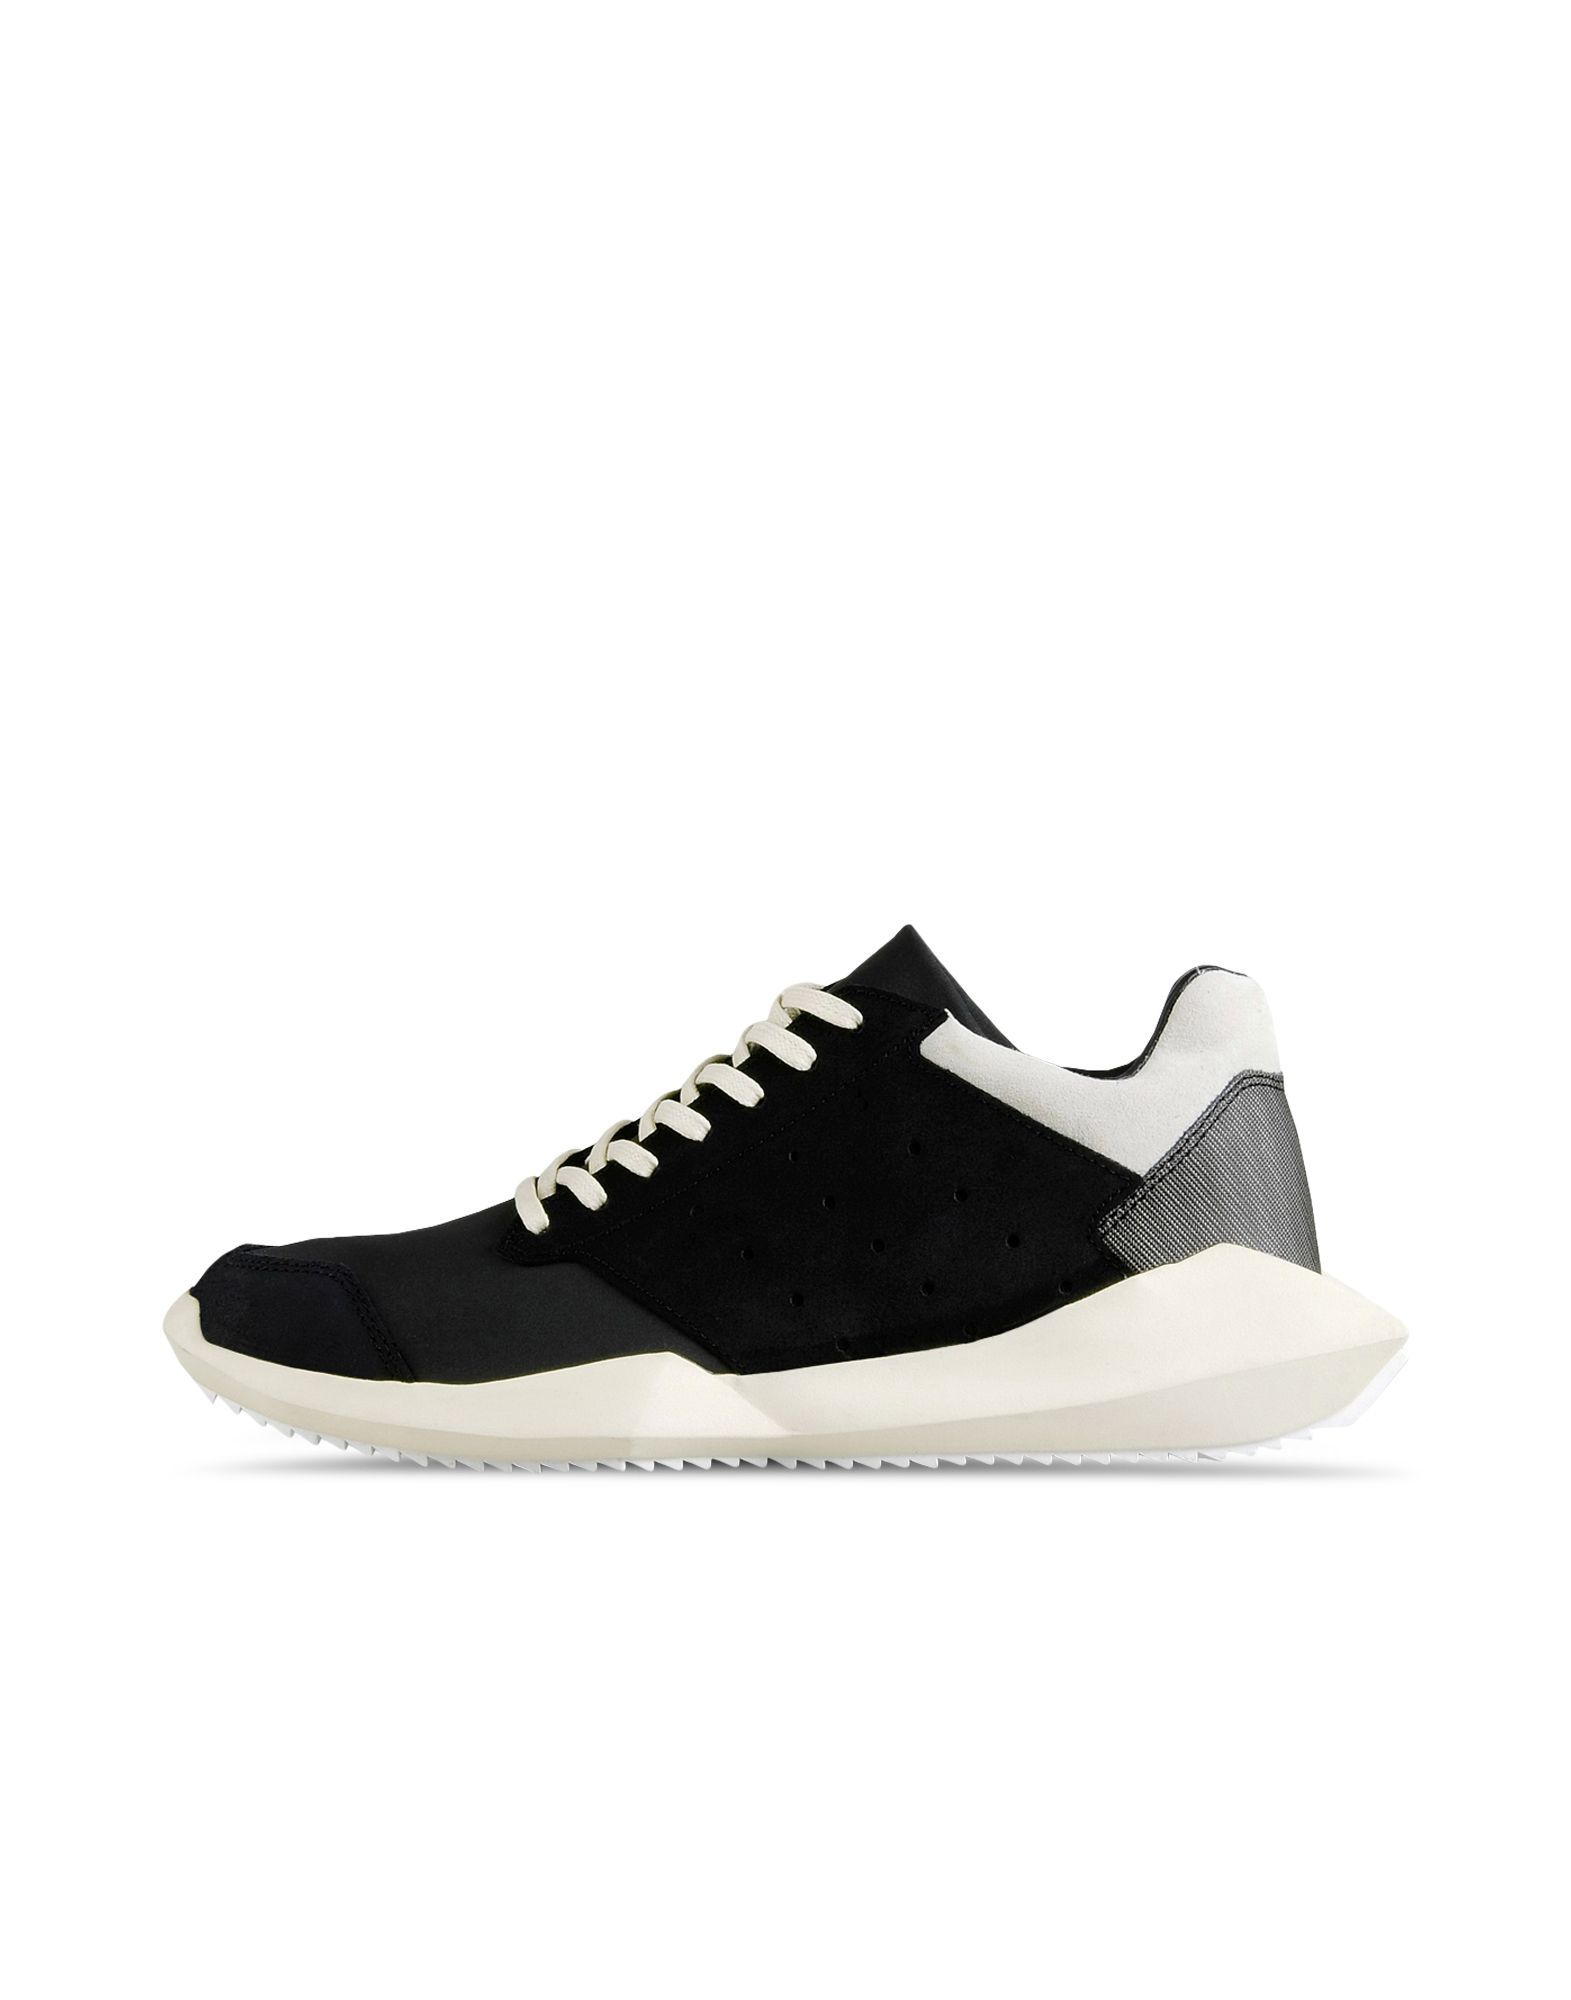 87fc6f63f71 Y-3 Online Store -, Rick Owens Tech Runner | Wear | Uñas pies y Deportes